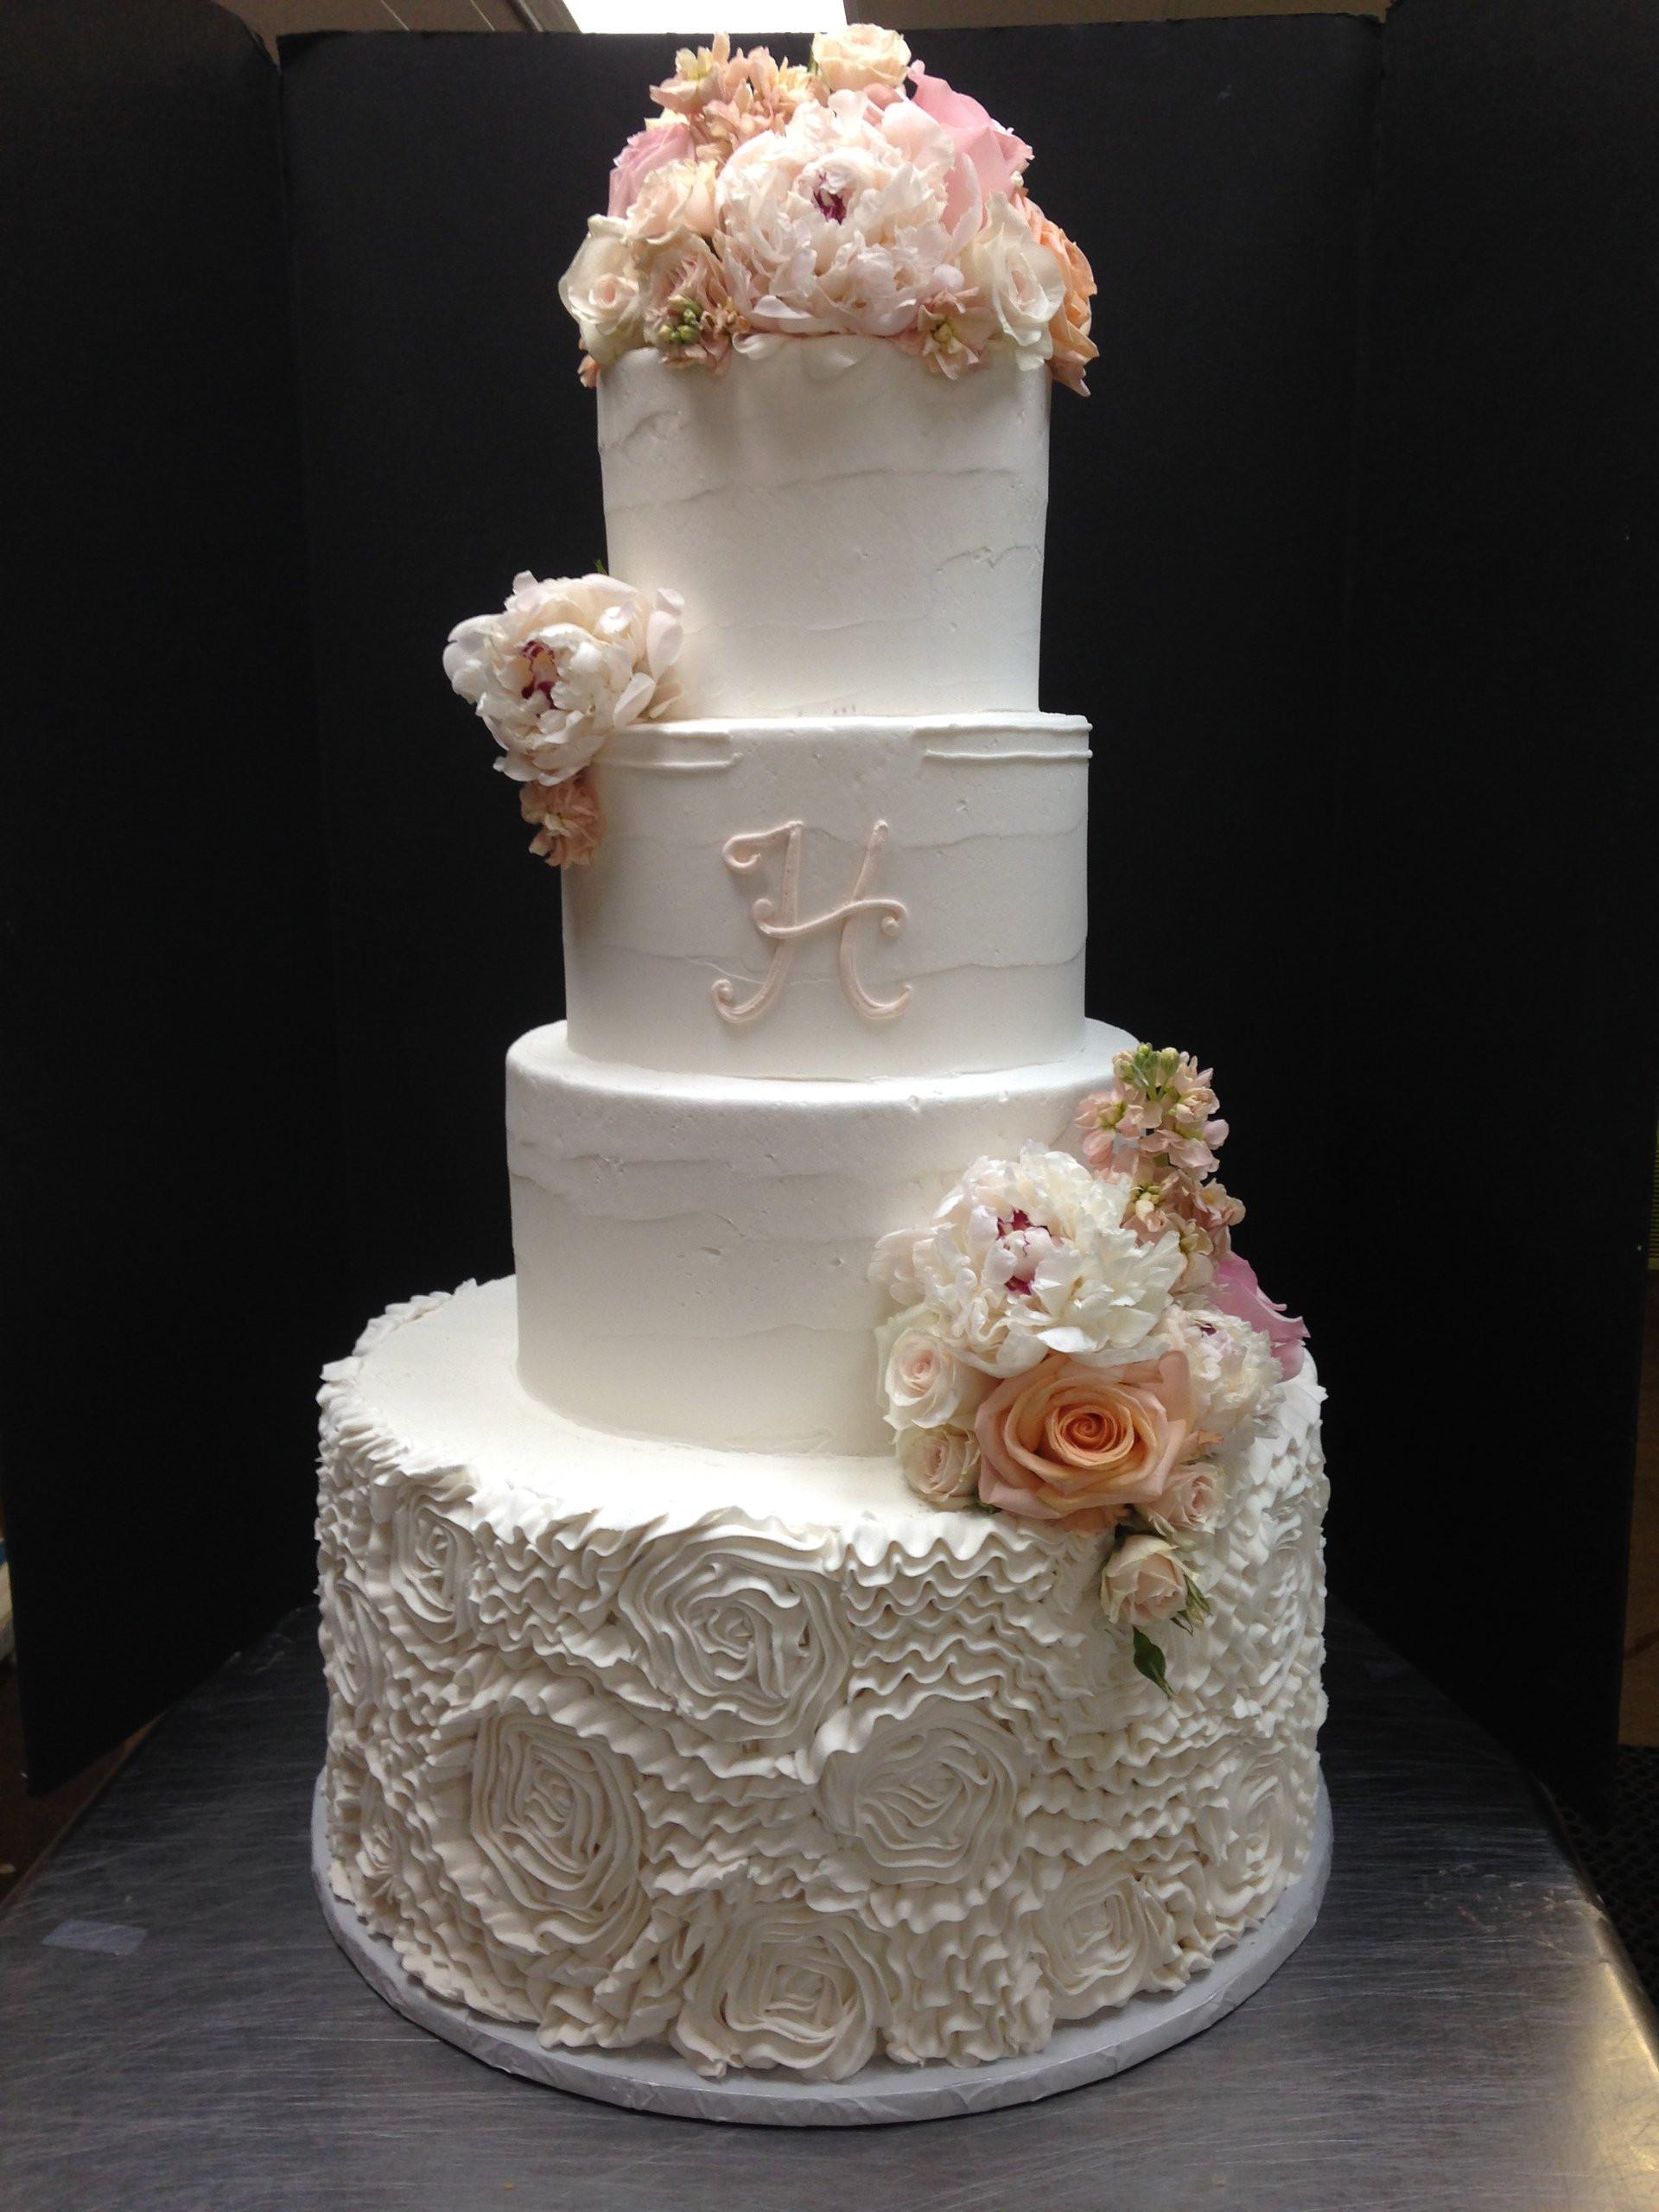 Dallas Wedding Cakes  Dallas Affaires Cake Co Dallas TX